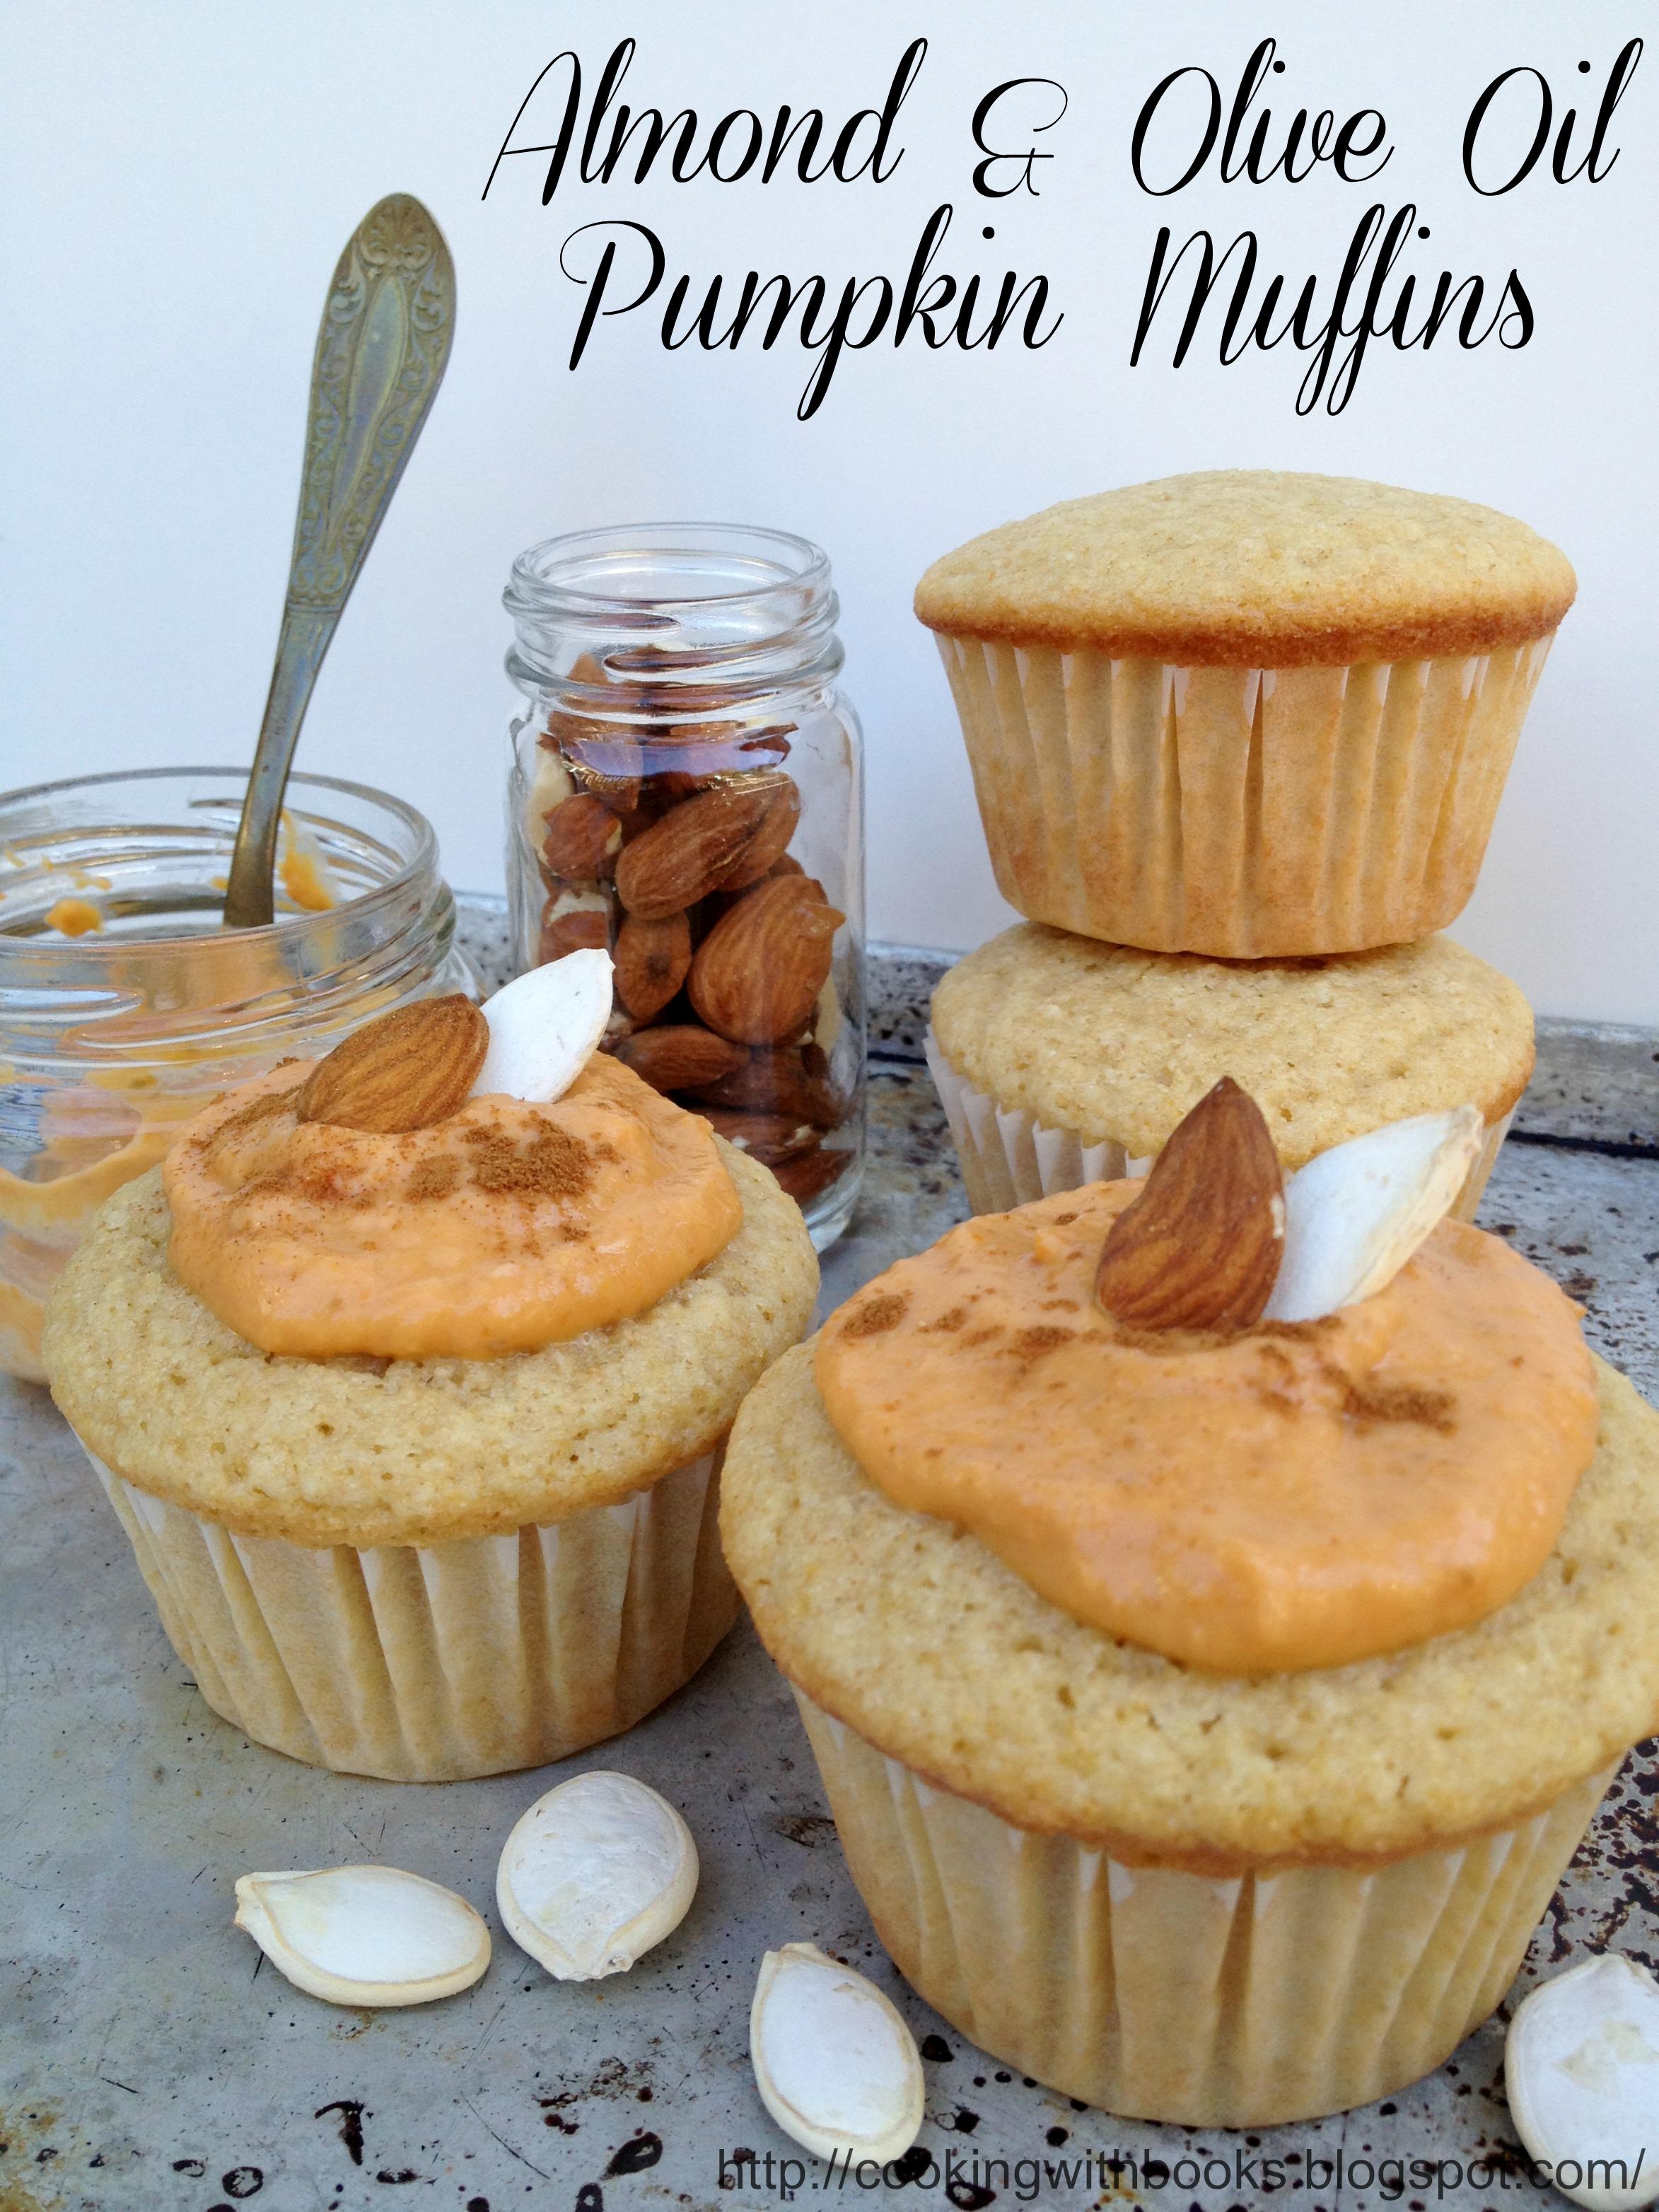 Almond & Olive Oil Muffins with a Greek Yogurt- Pumpkin Glaze